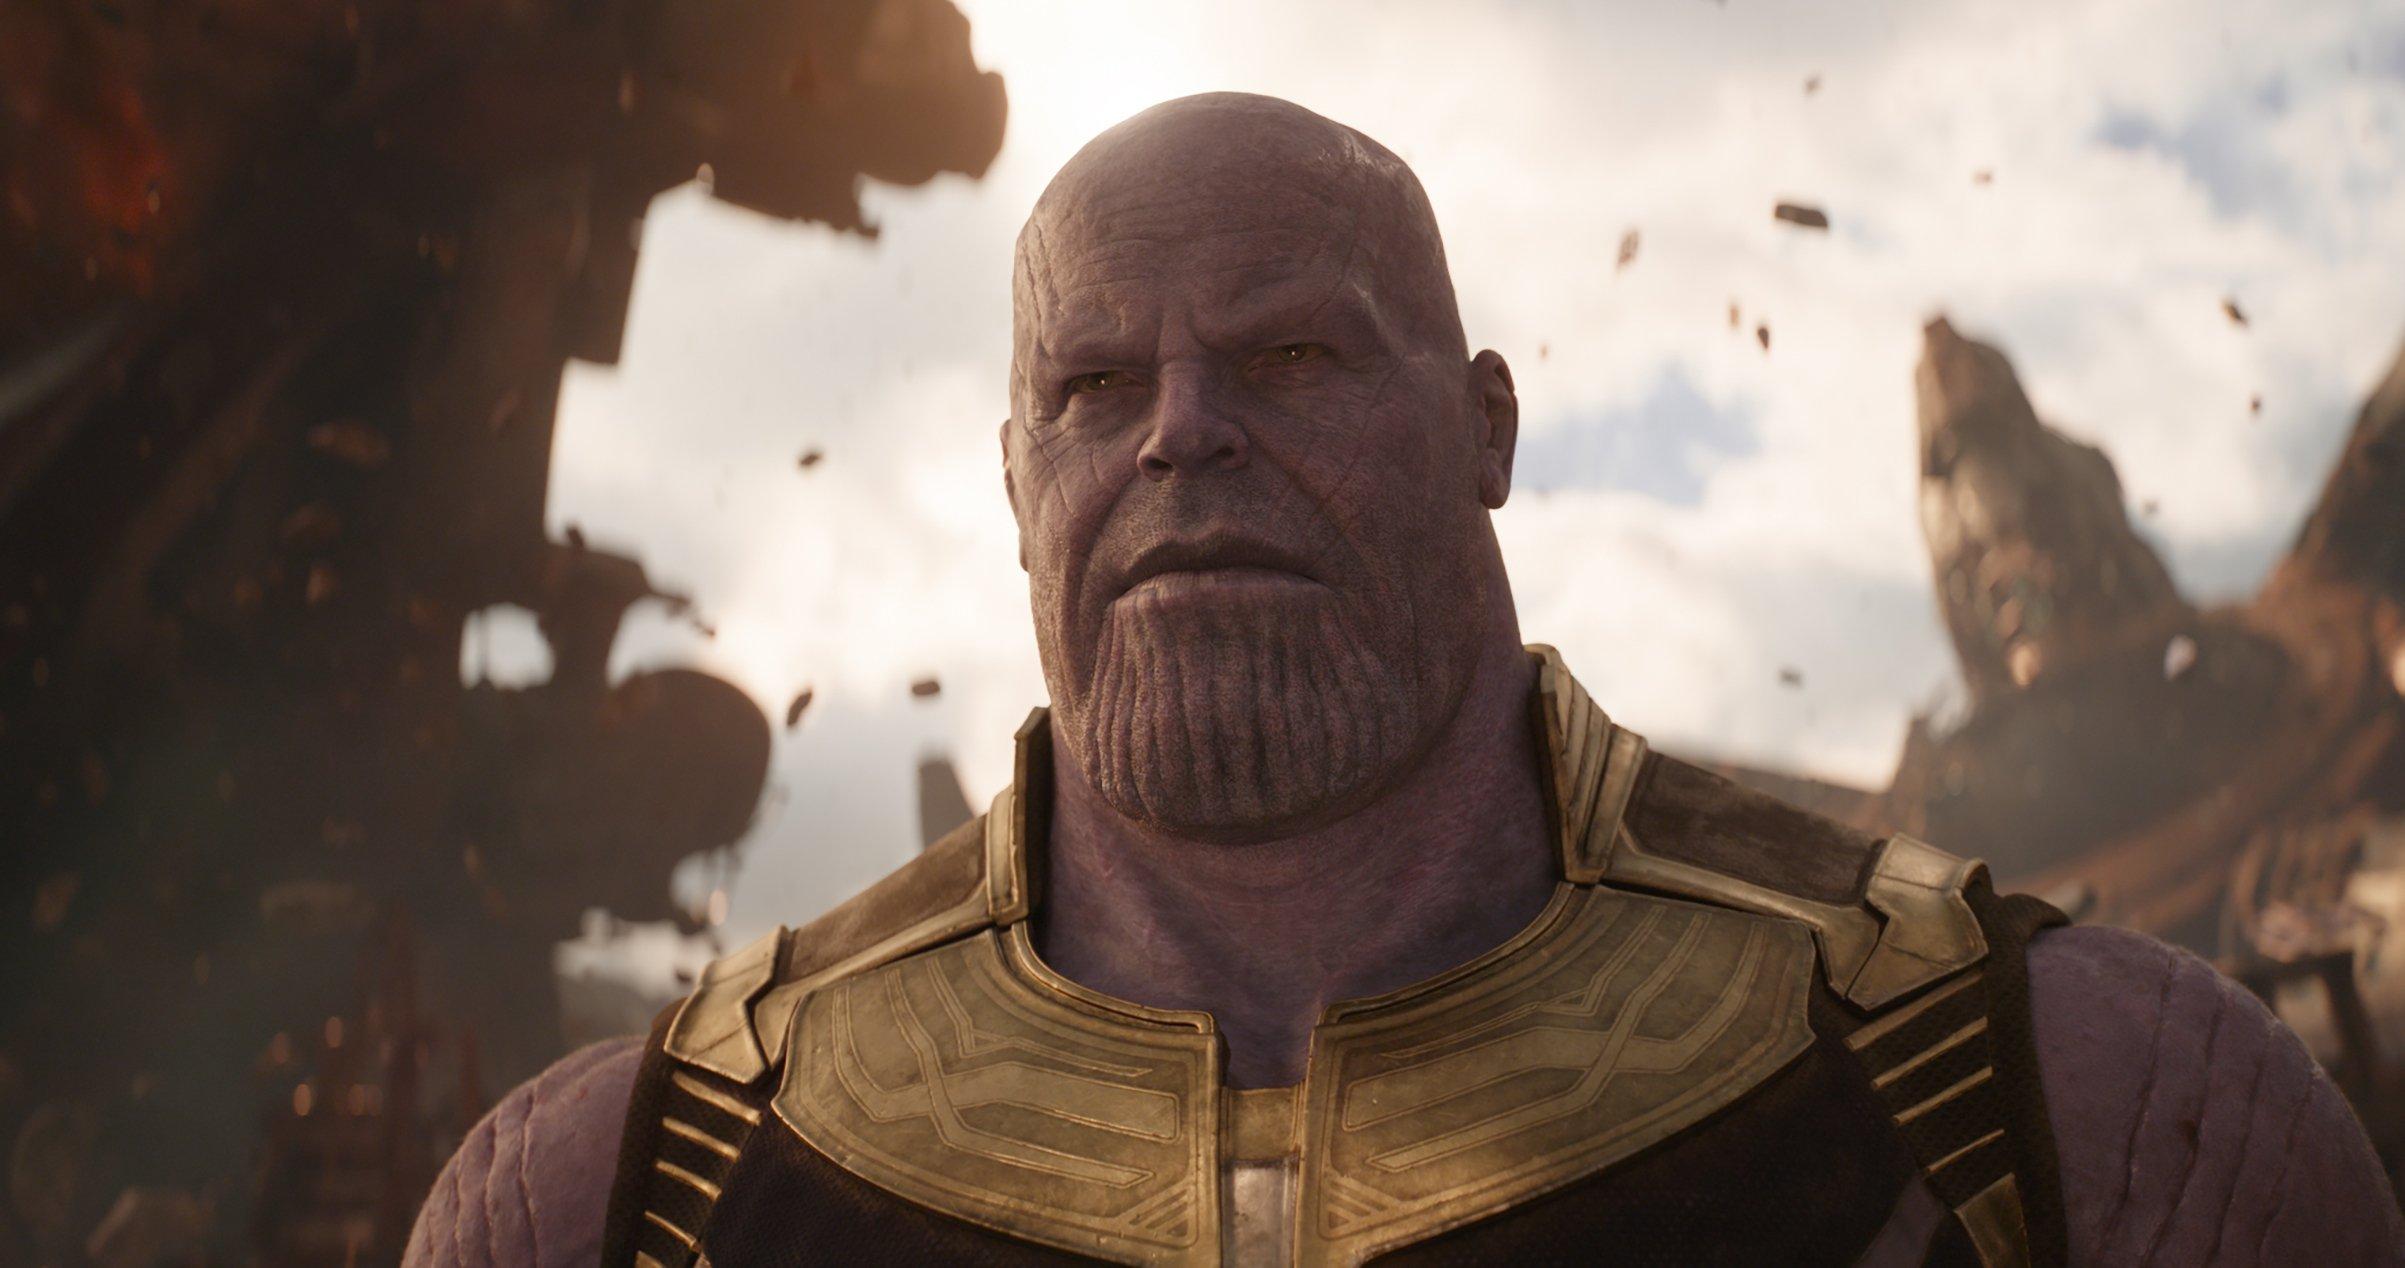 Photo: Avengers: Infinity War / Marvel